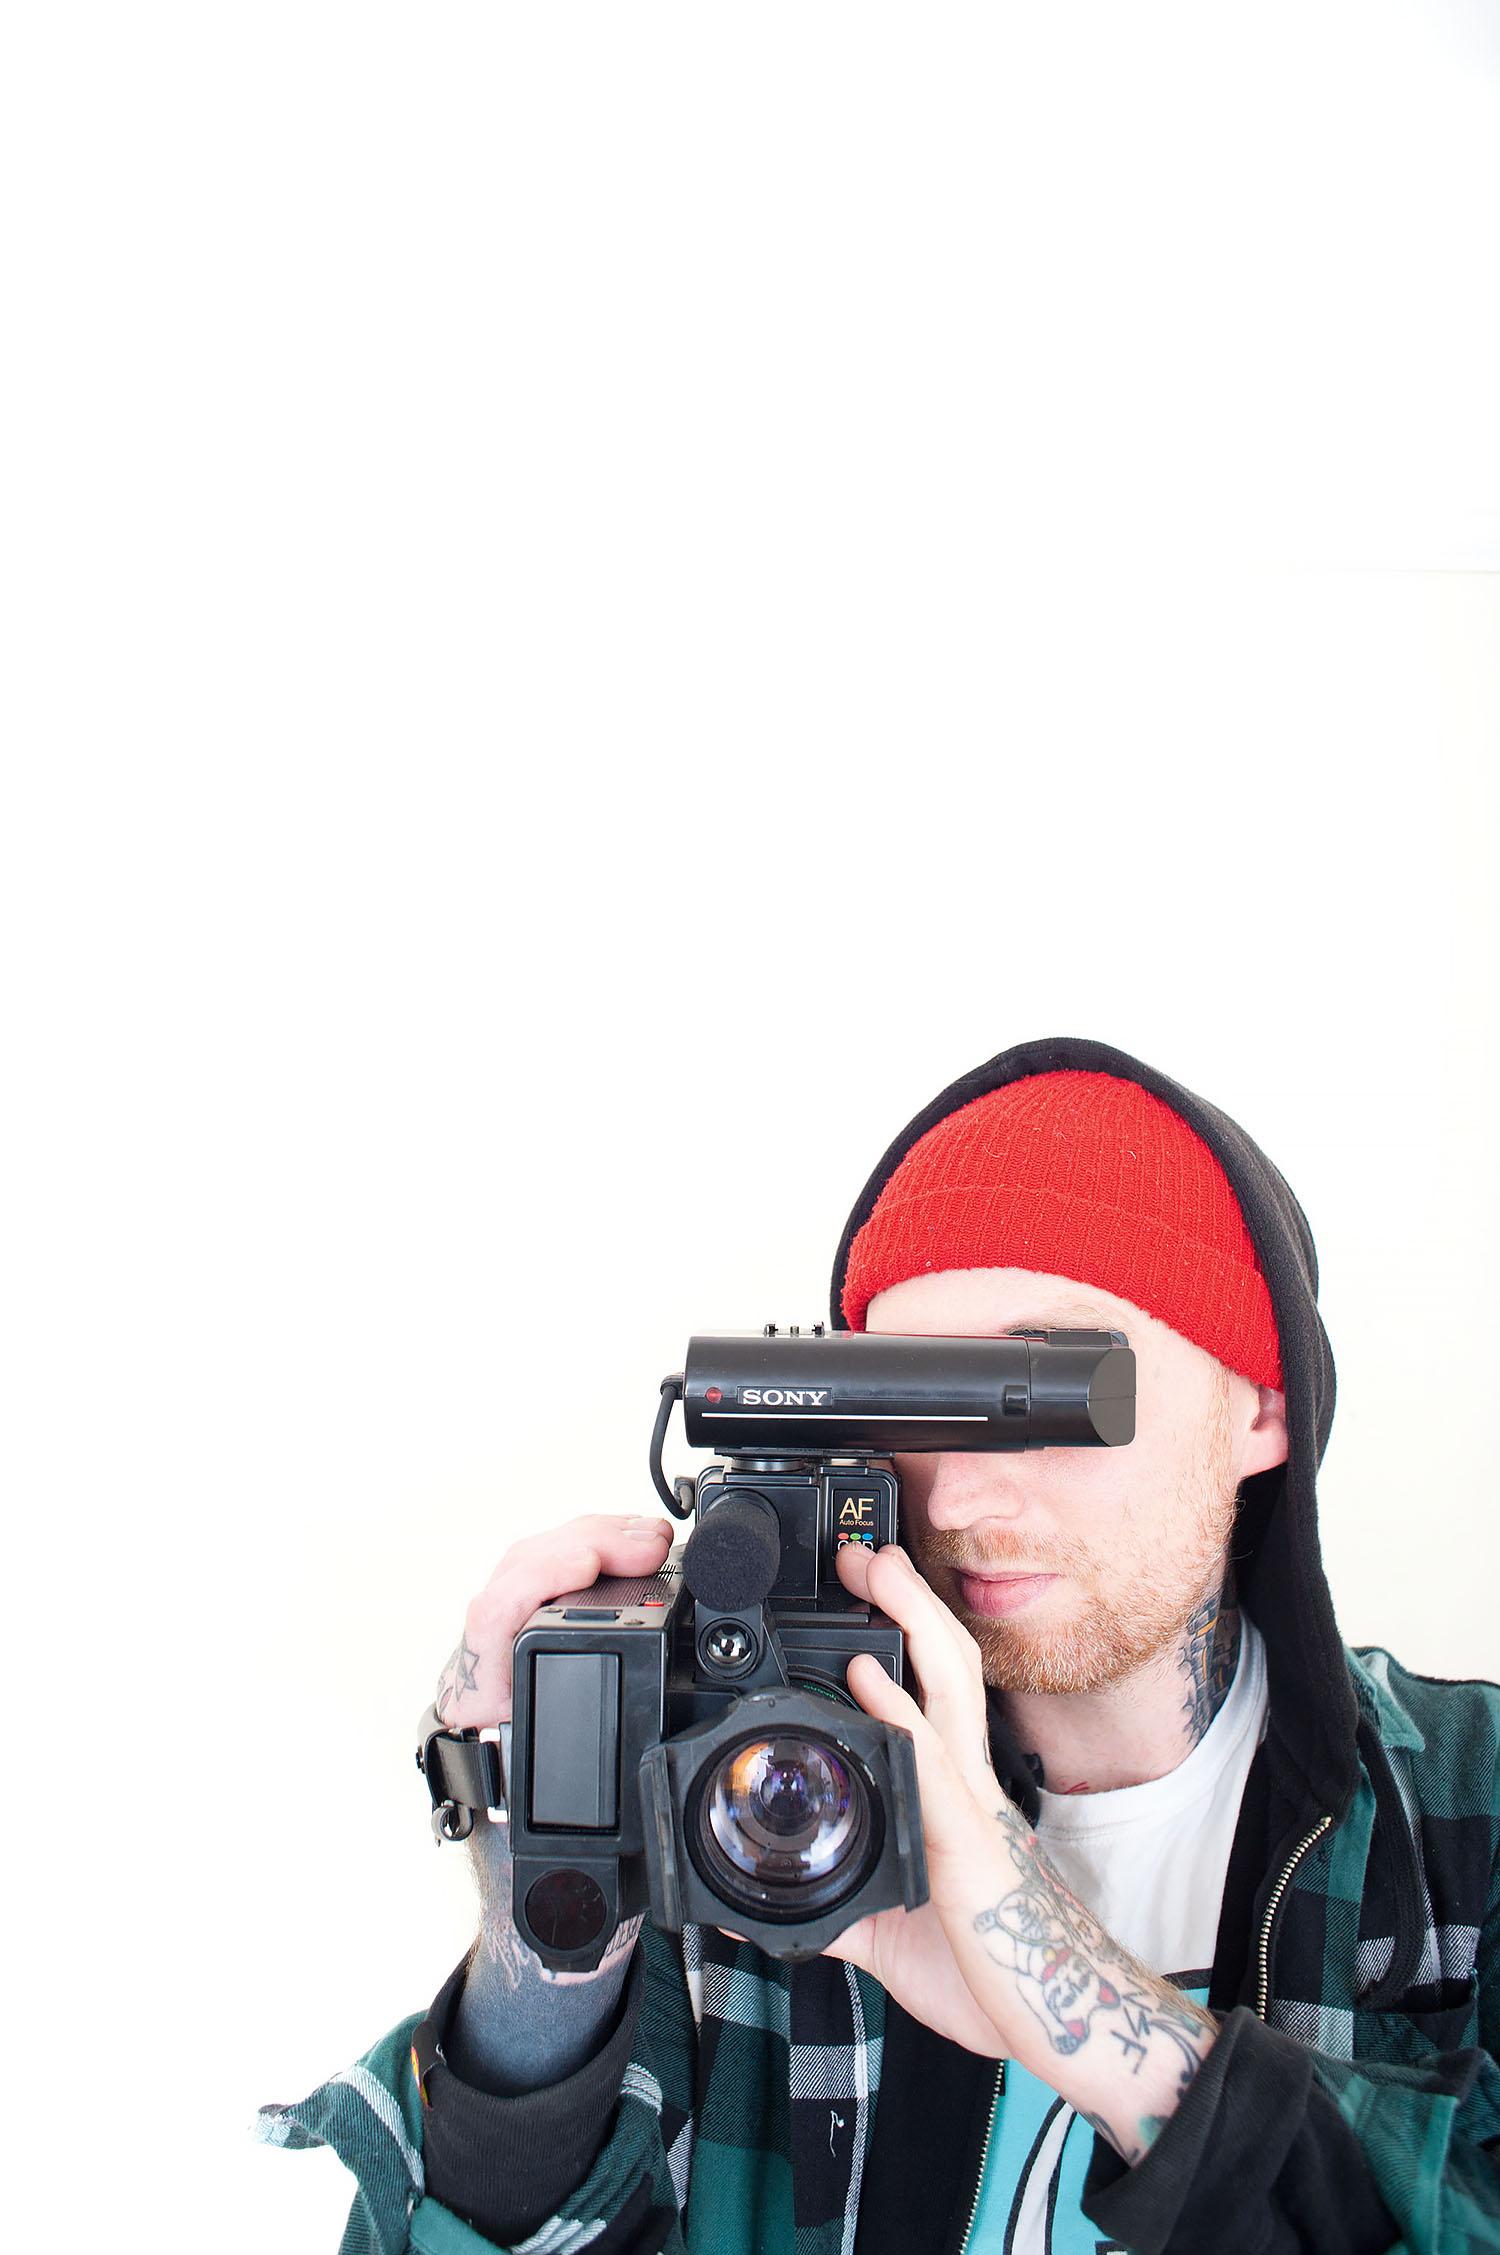 james cox portrait.jpg